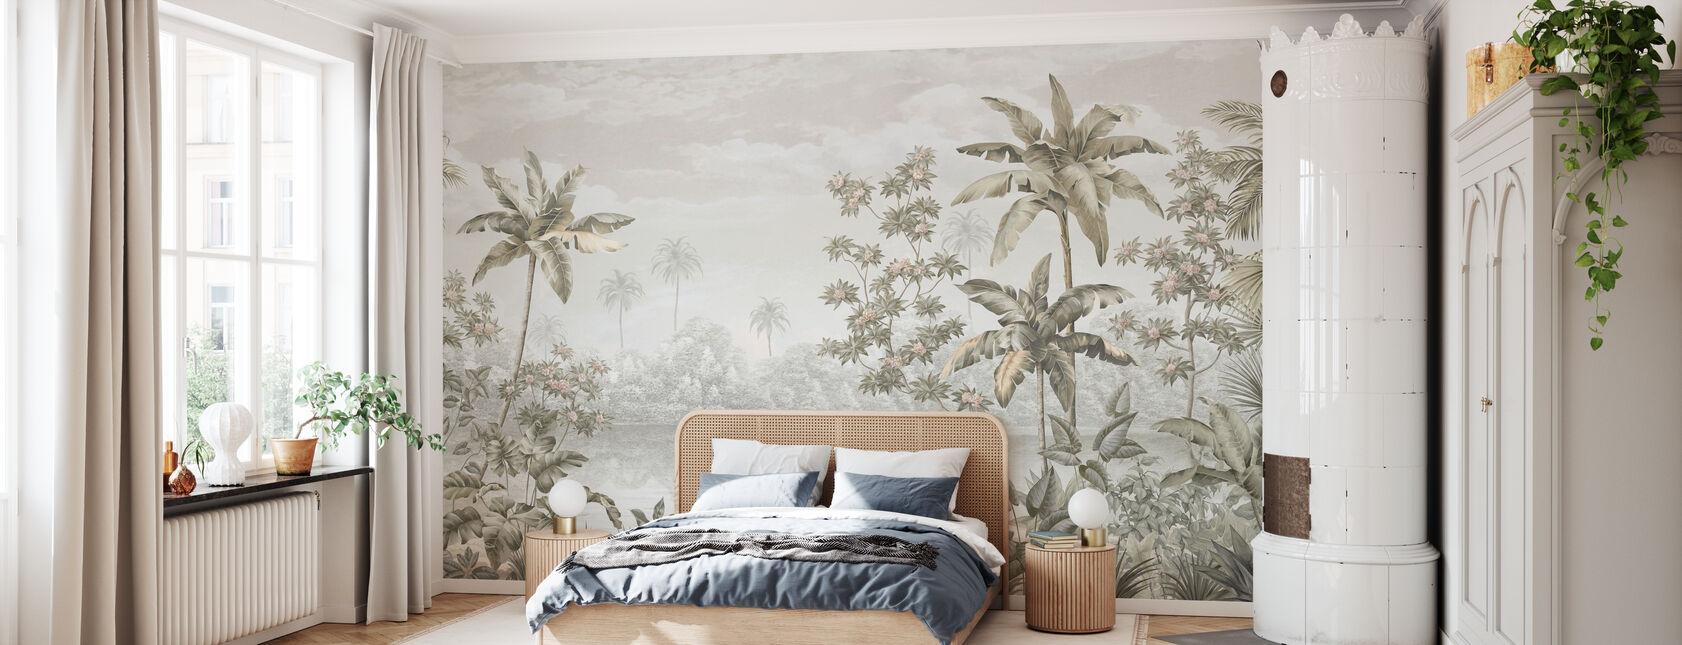 Tropical Shangri-La - Sepia - Papel pintado - Dormitorio